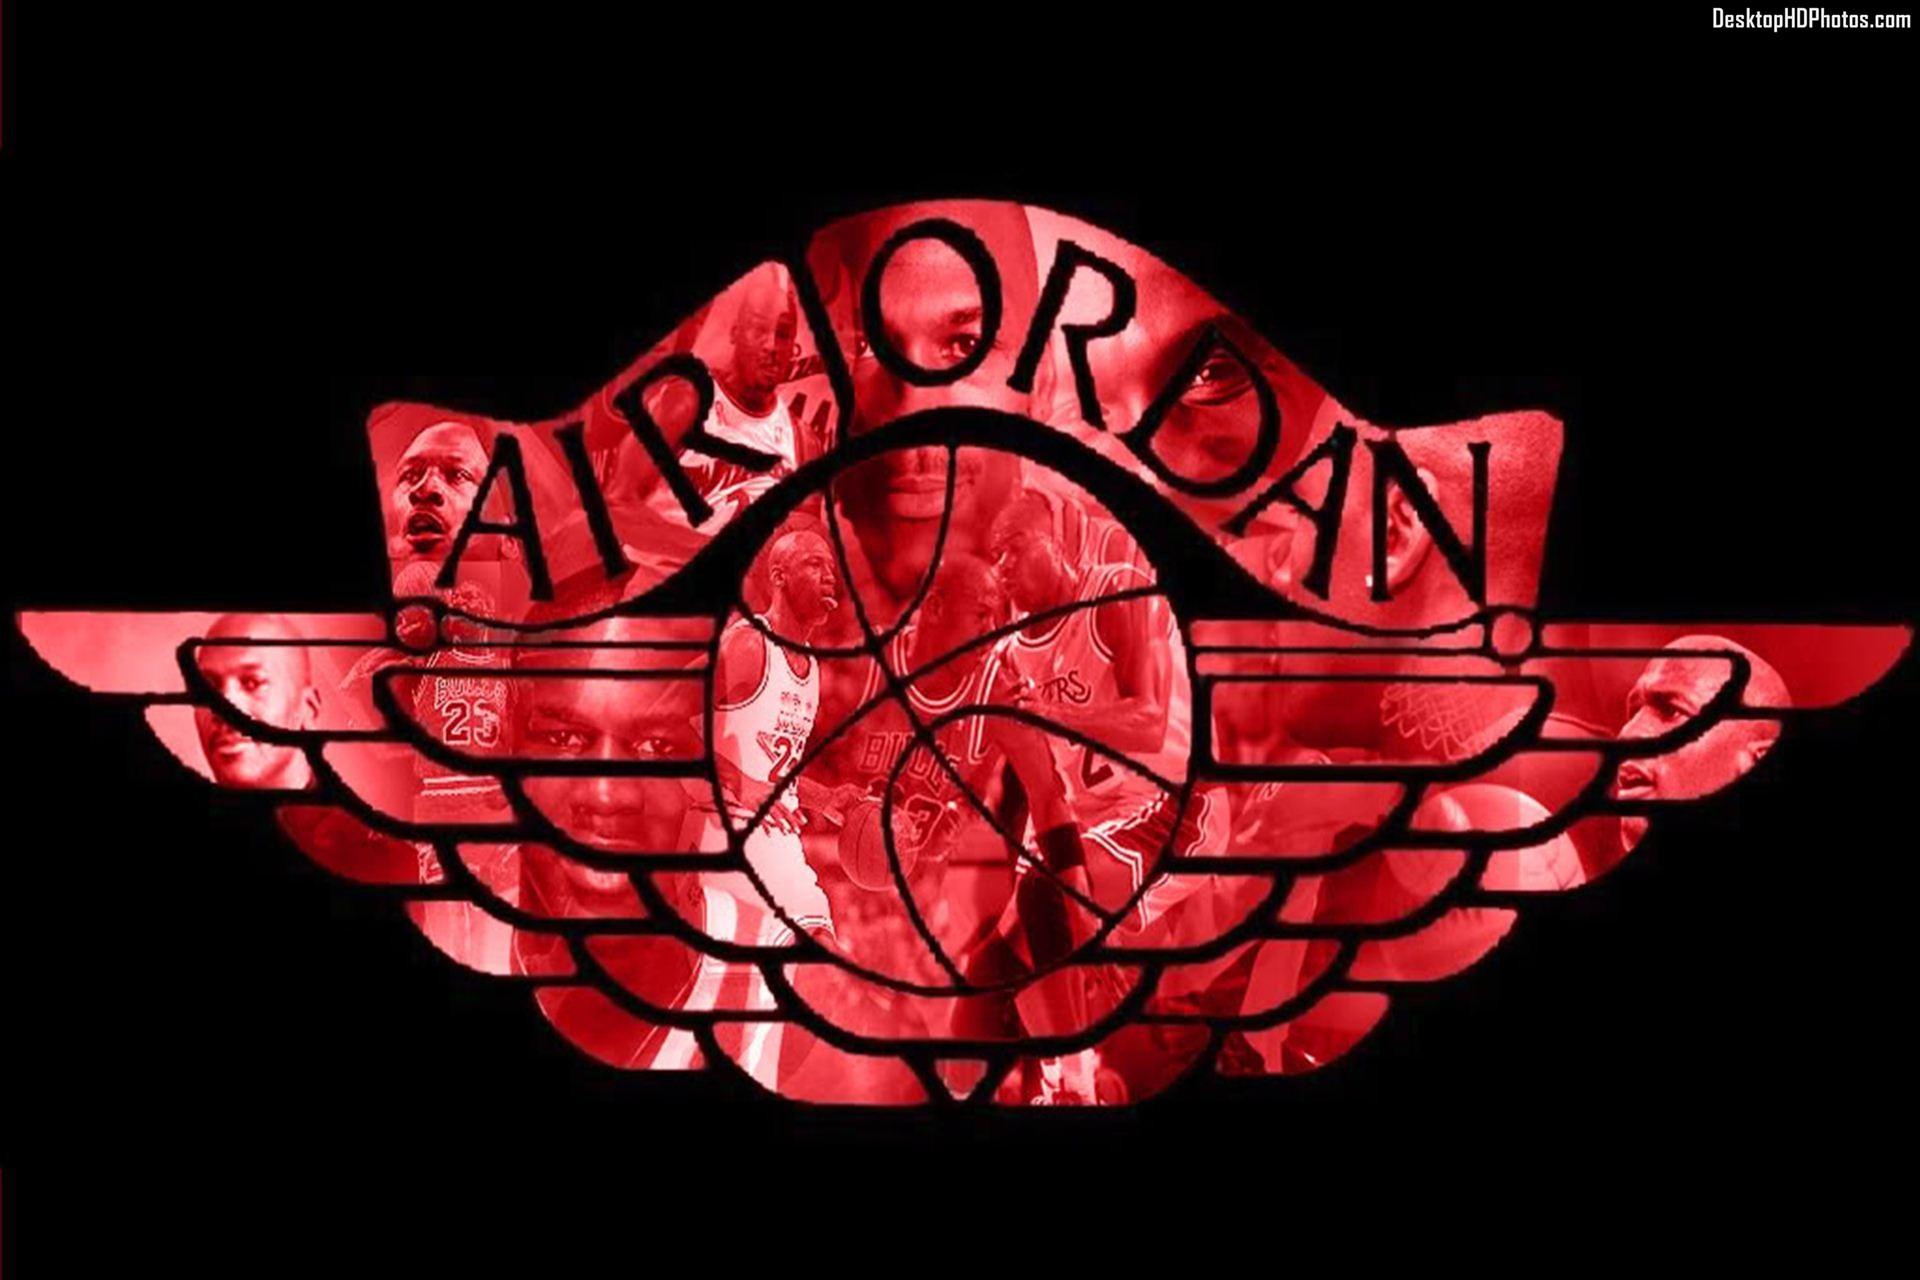 Air Jordan Iphone Wallpaper 1920x1280